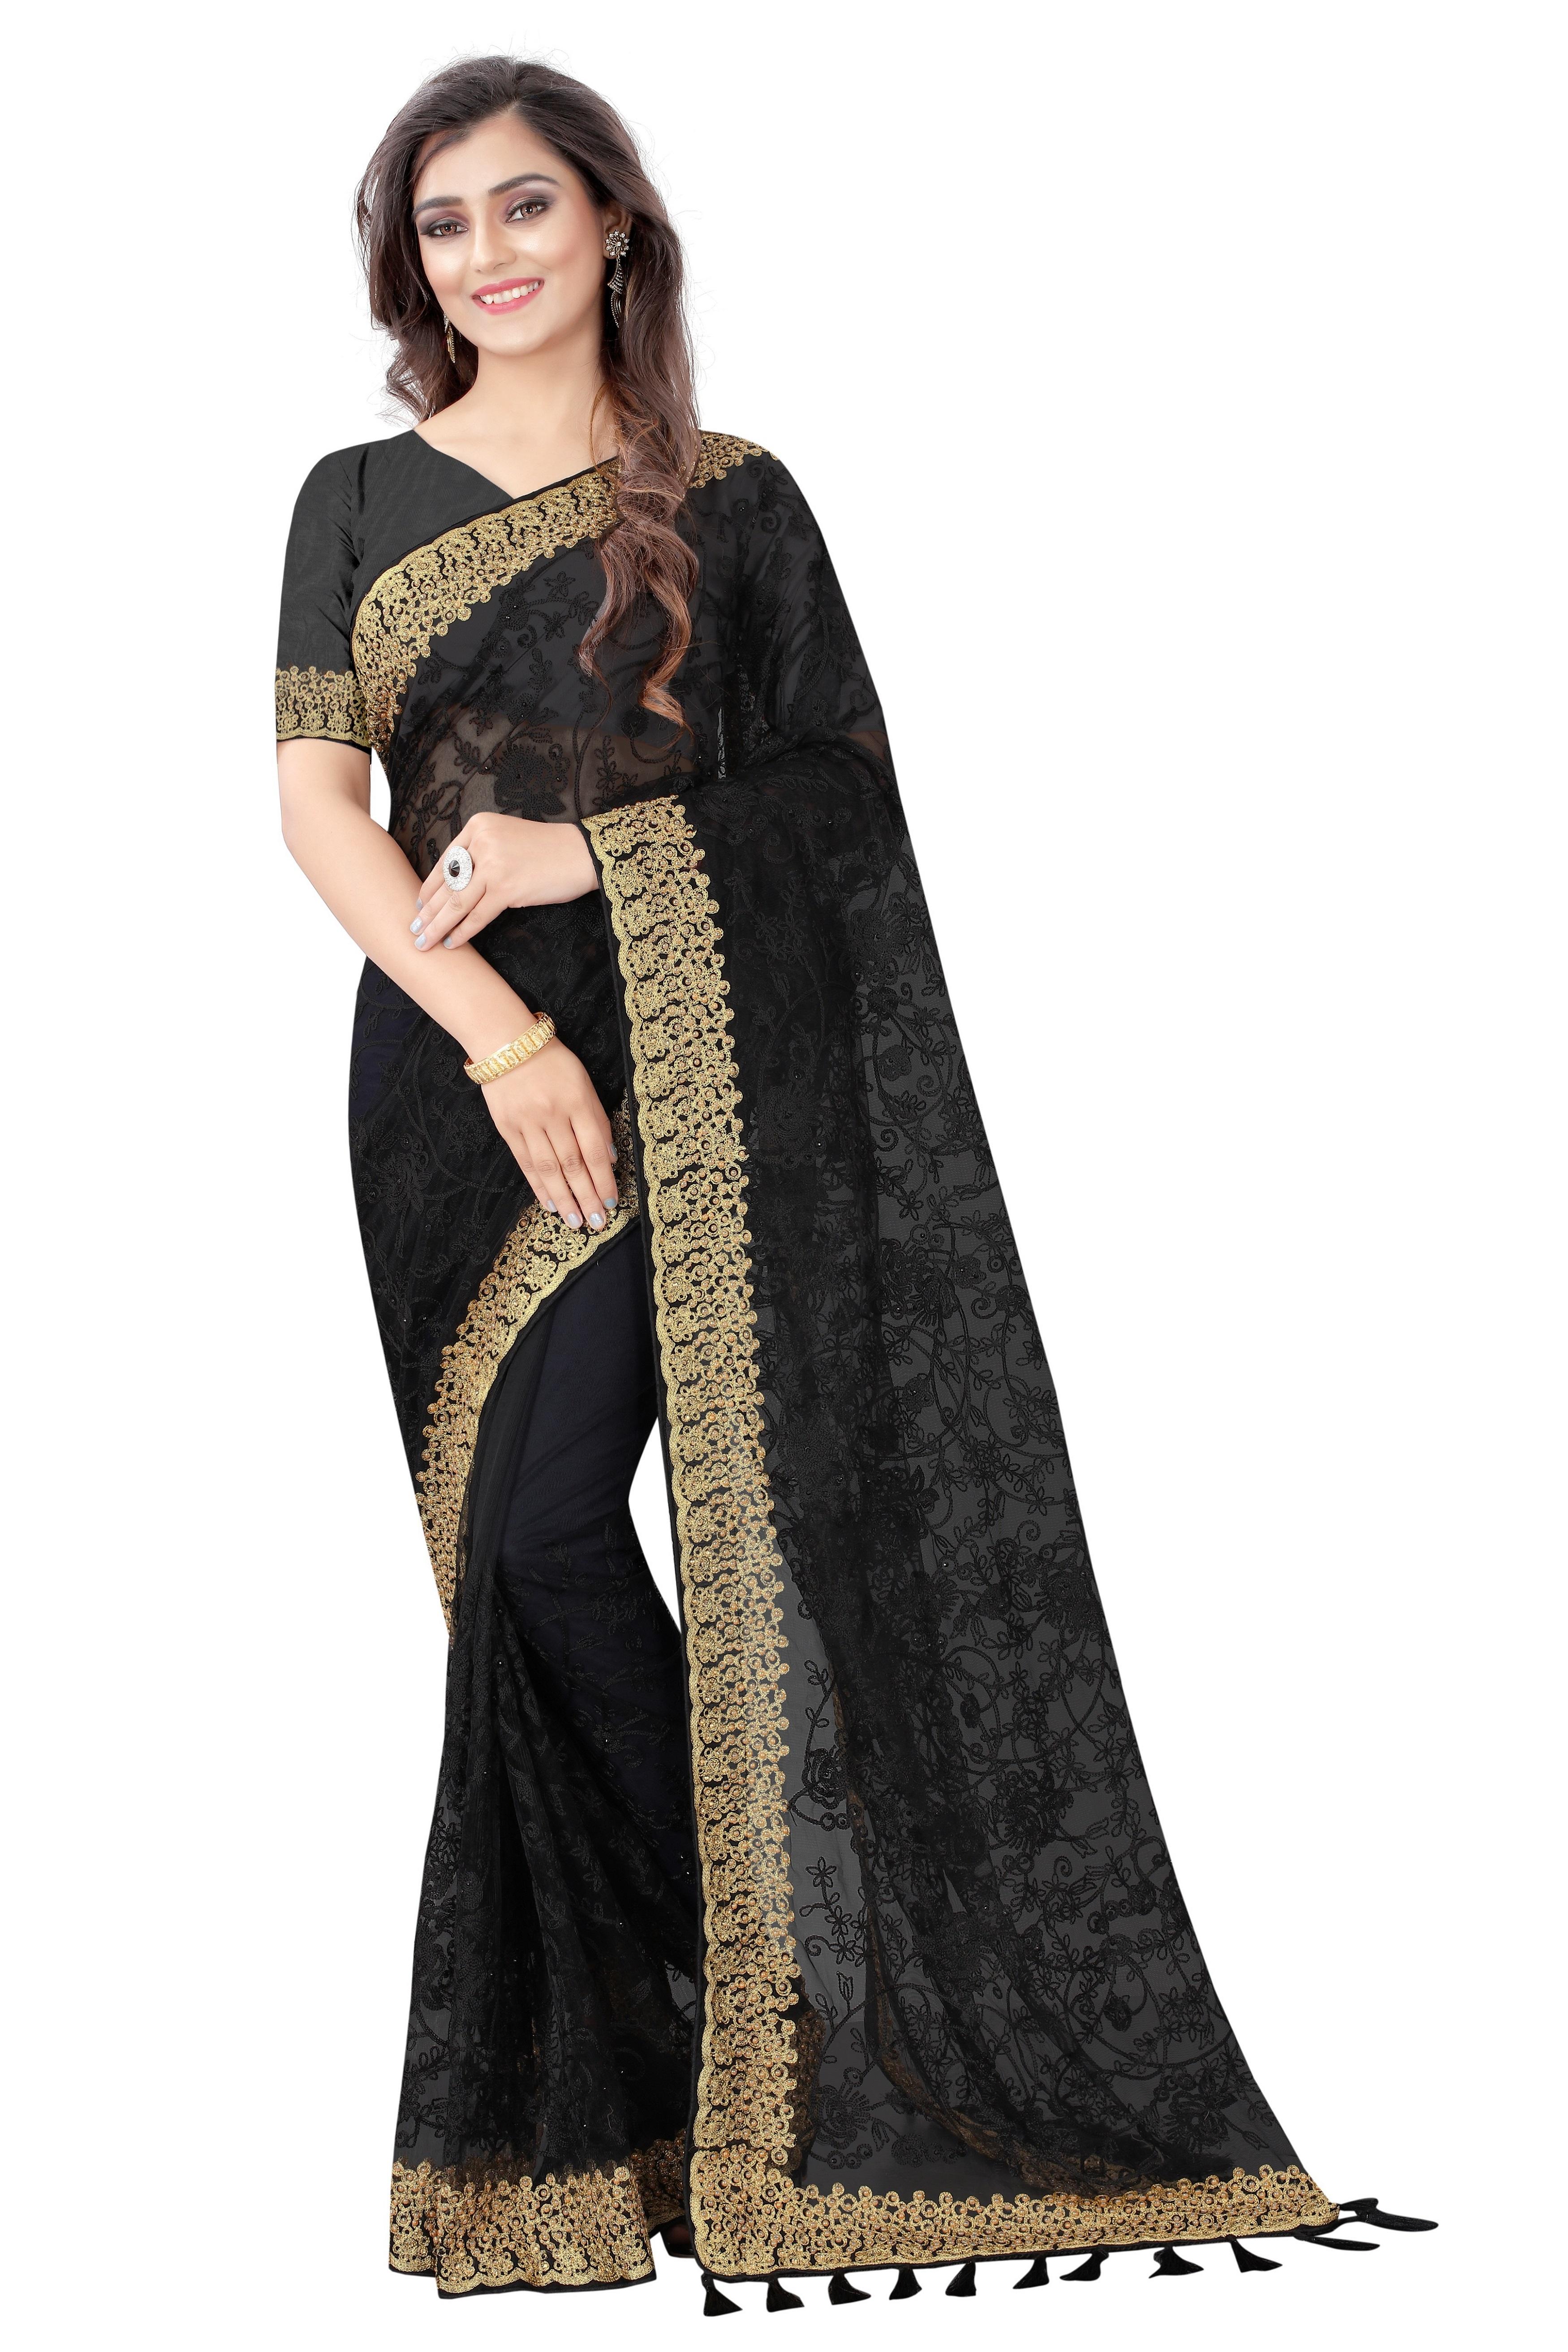 AWRIYA | AWRIYA Women's Chikankari Embroidery Work Net Saree with Applique Stone Work - RUHI-1 Black